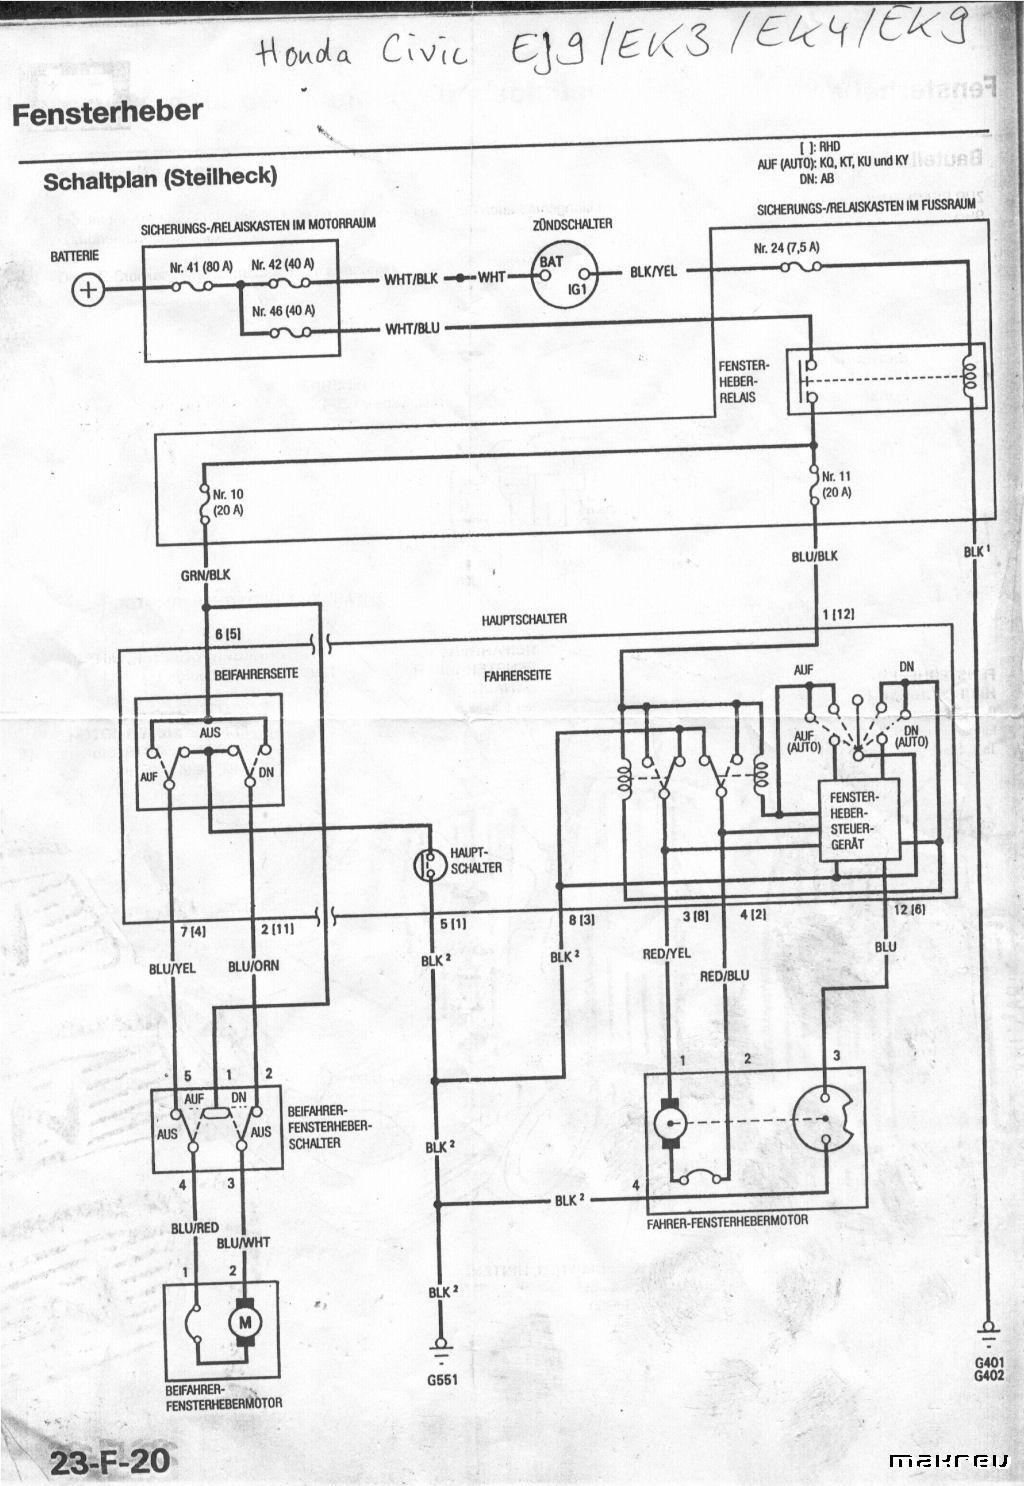 Fein 91 Crx Schaltplan Fotos - Schaltplan Serie Circuit Collection ...